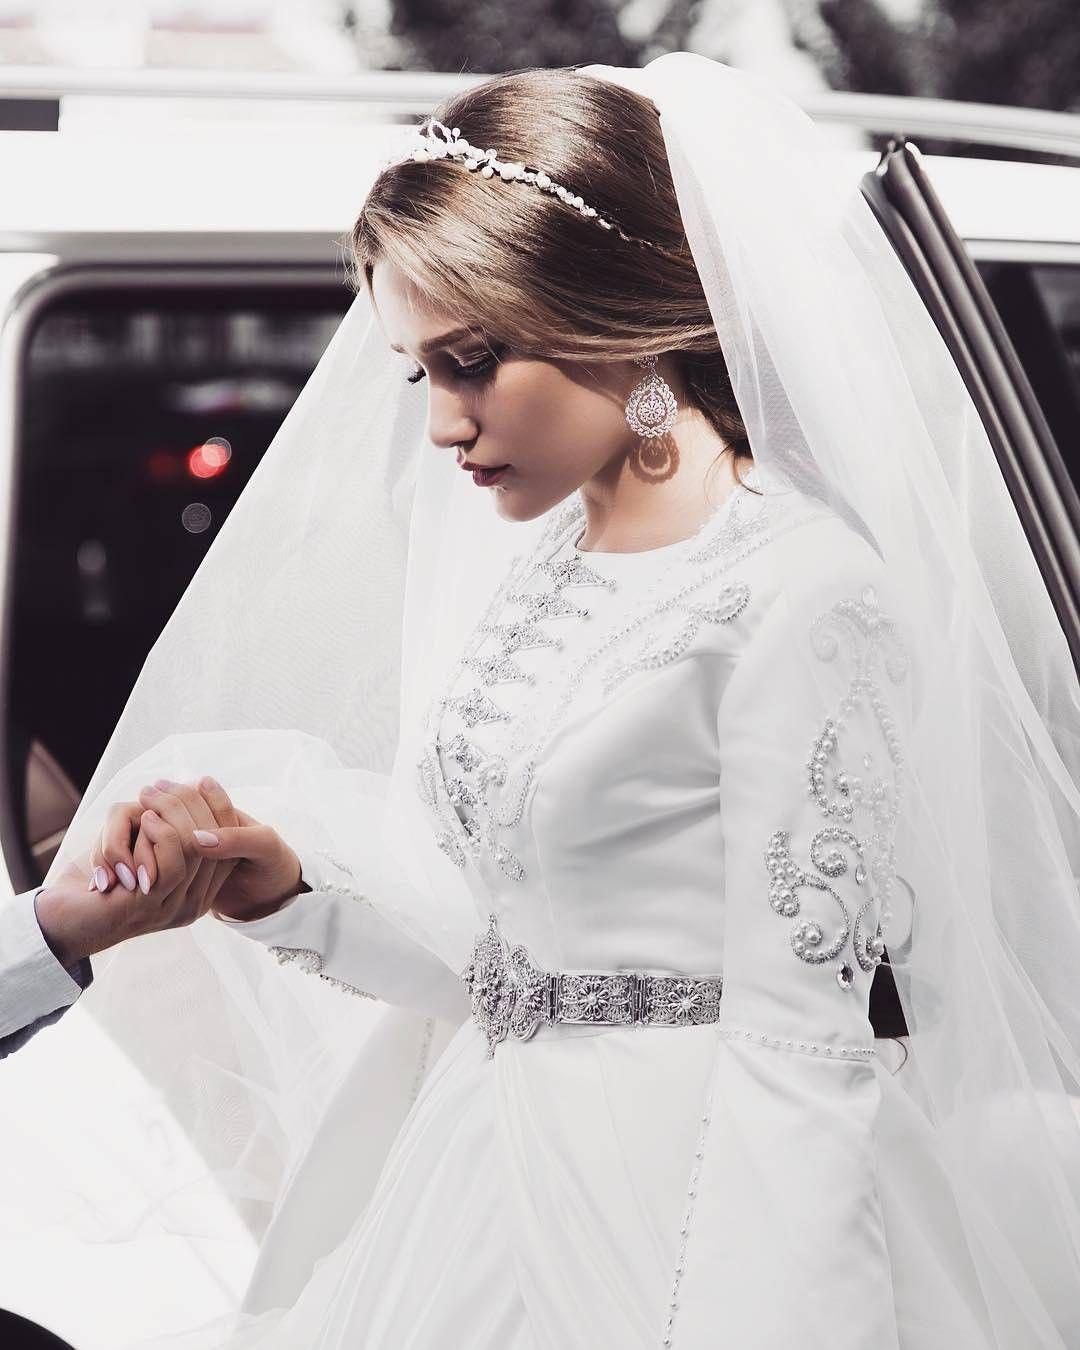 Chechen wedding pinterest